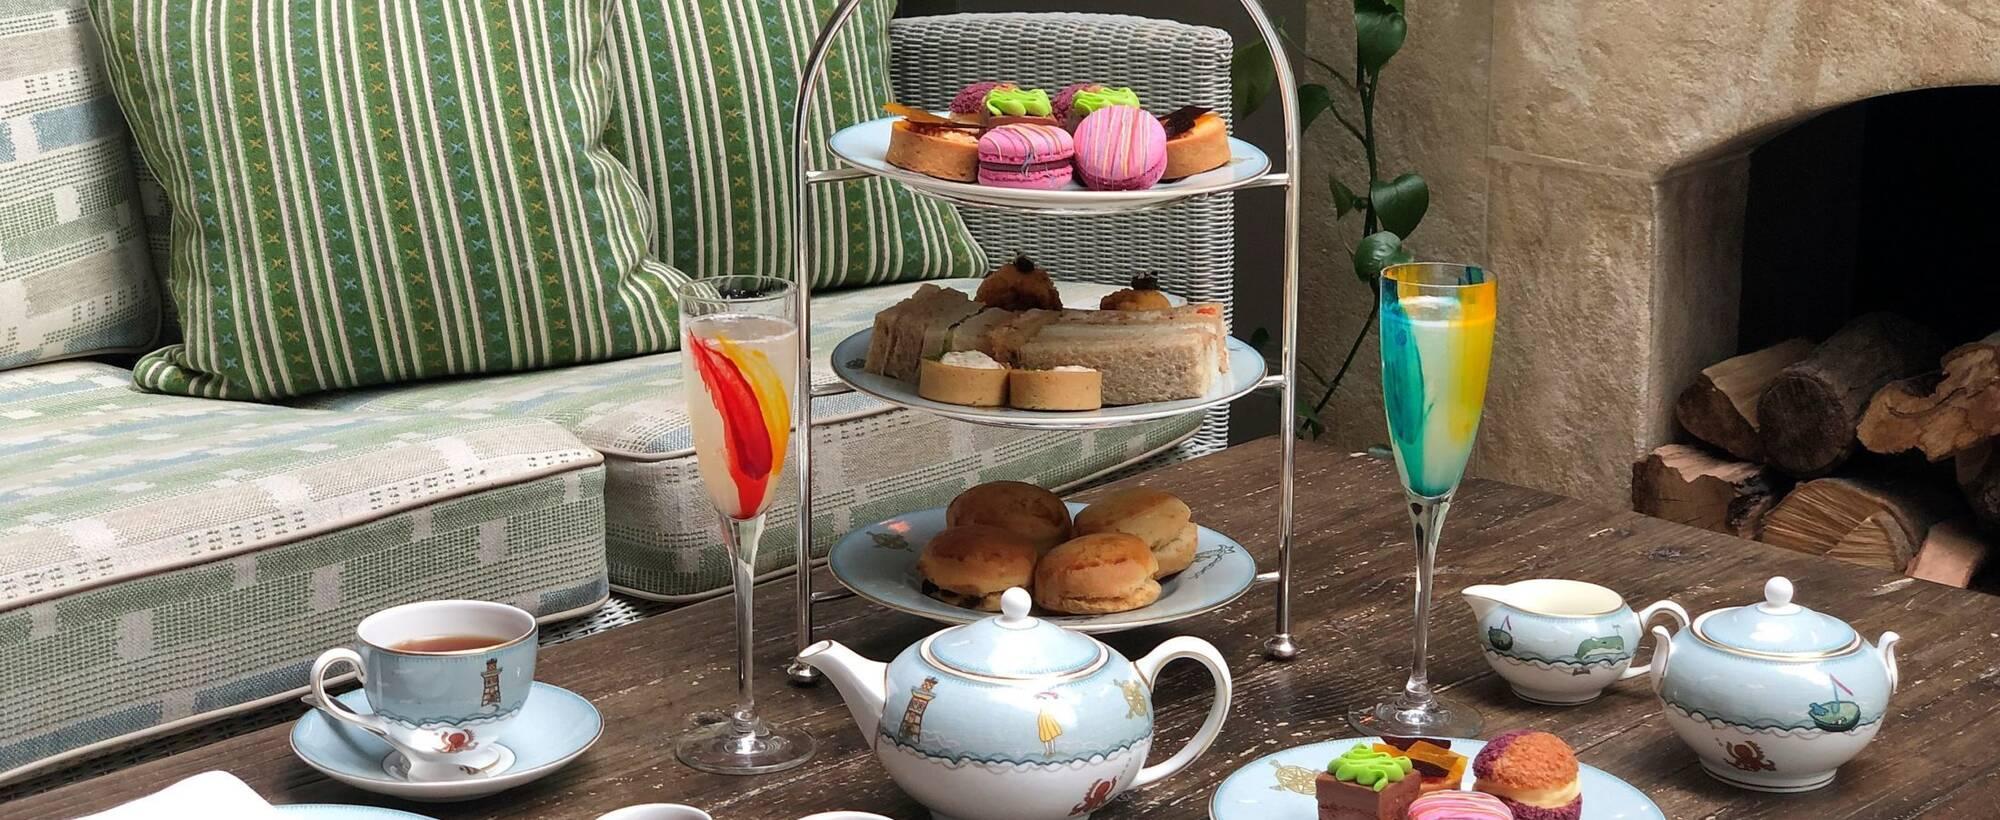 1 Art of London Afternoon Tea at Ham Yard Hotel